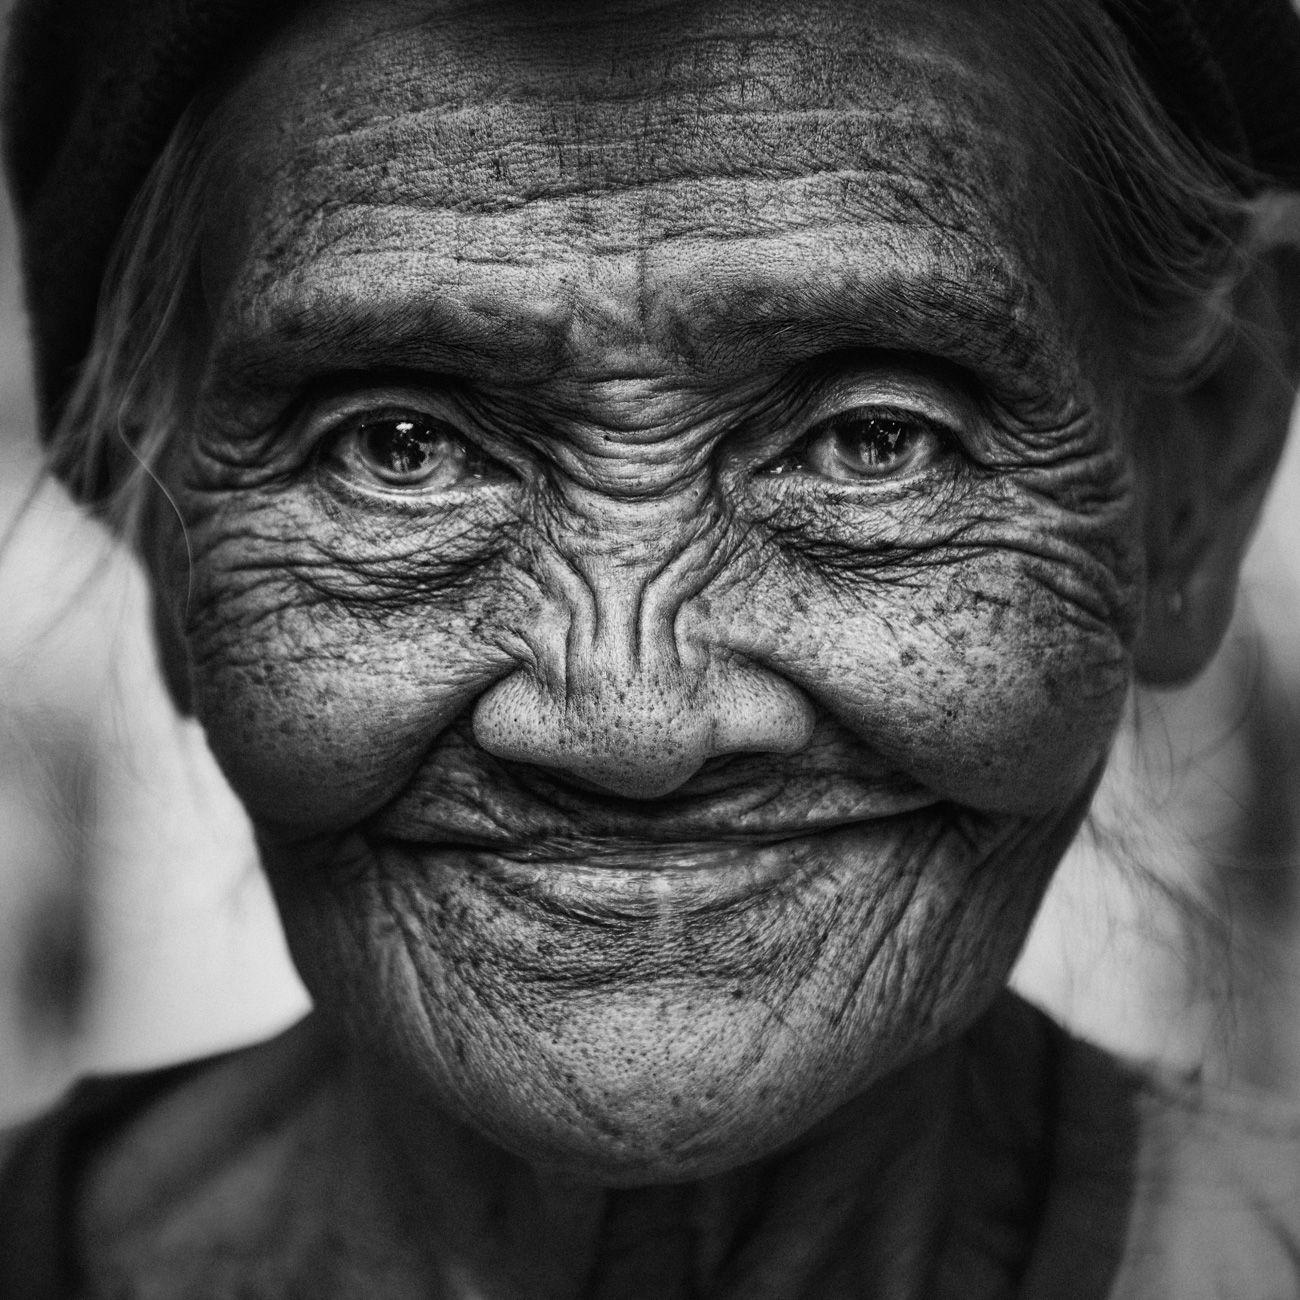 Fotograaf amersfoort thomas thijssen fotografie faces black and white portraits 5